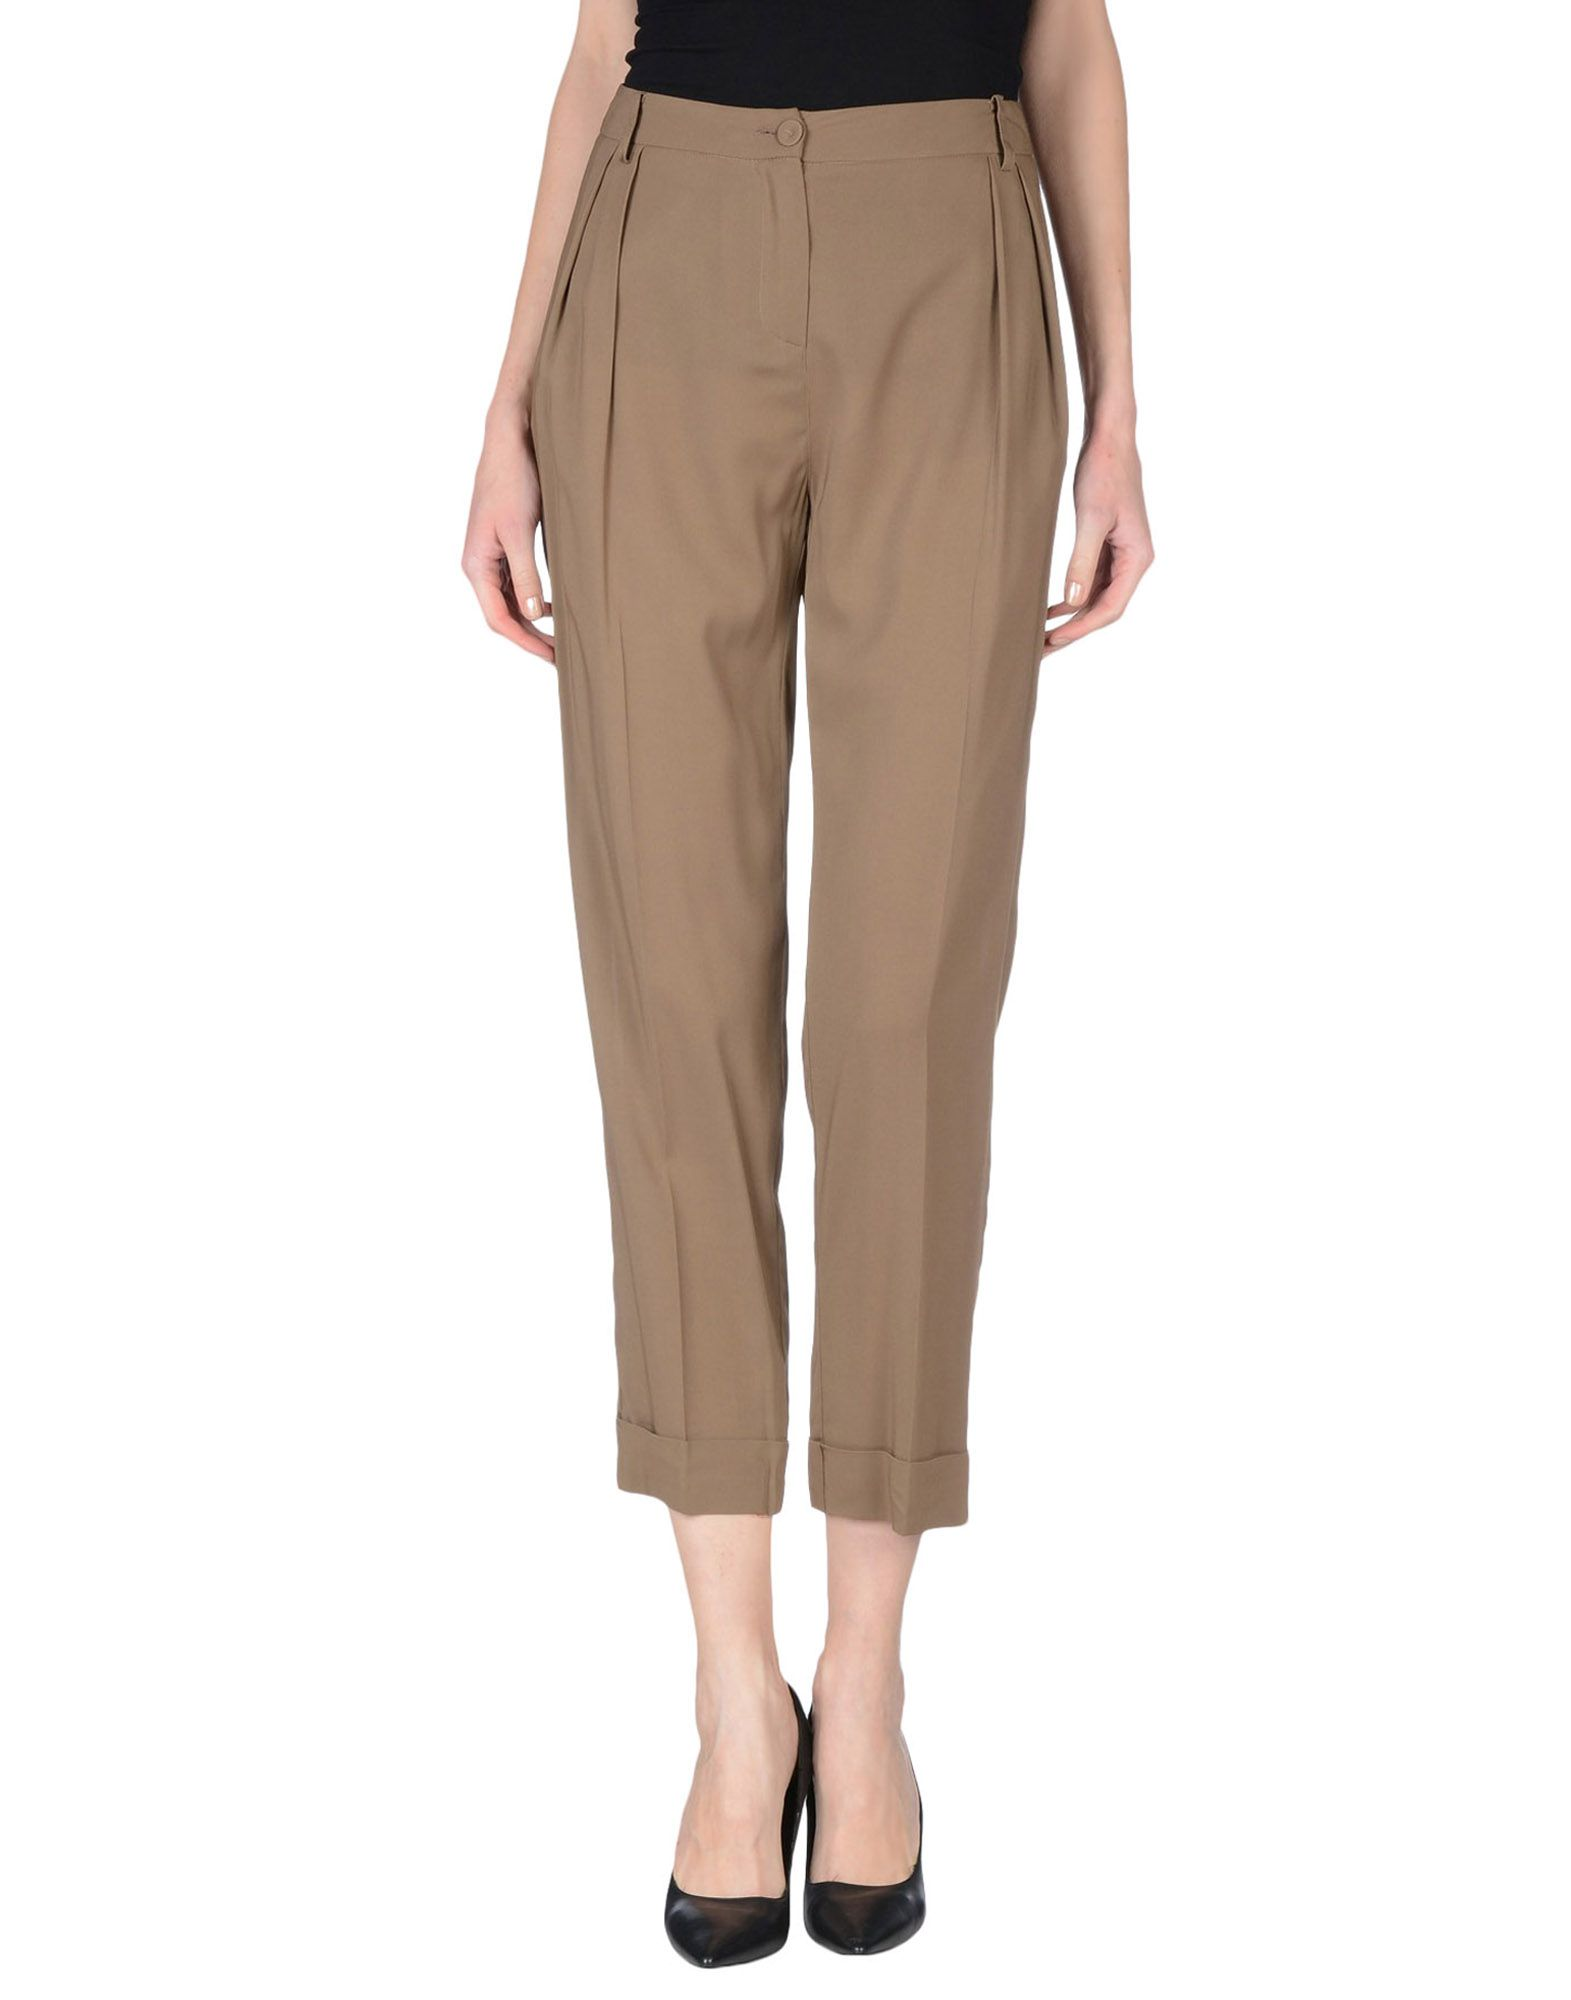 PATRIZIA PEPE SERA Повседневные брюки patrizia pepe джинсы с 5 карманами с широкими штанинами